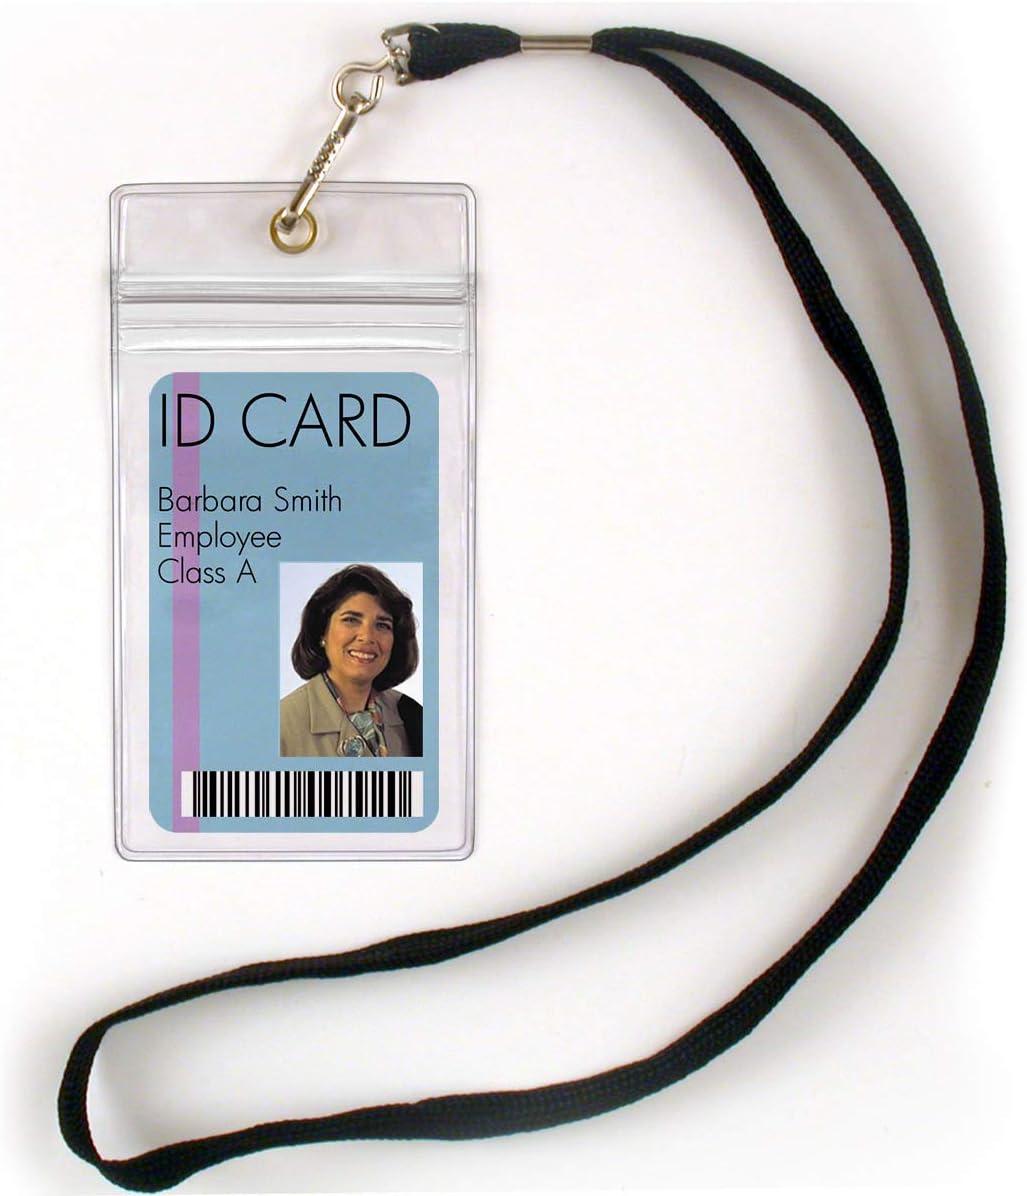 StoreSMART - 100 Pack 毎日がバーゲンセール ID Badge Lanyard Pla with 限定モデル Holder Clear